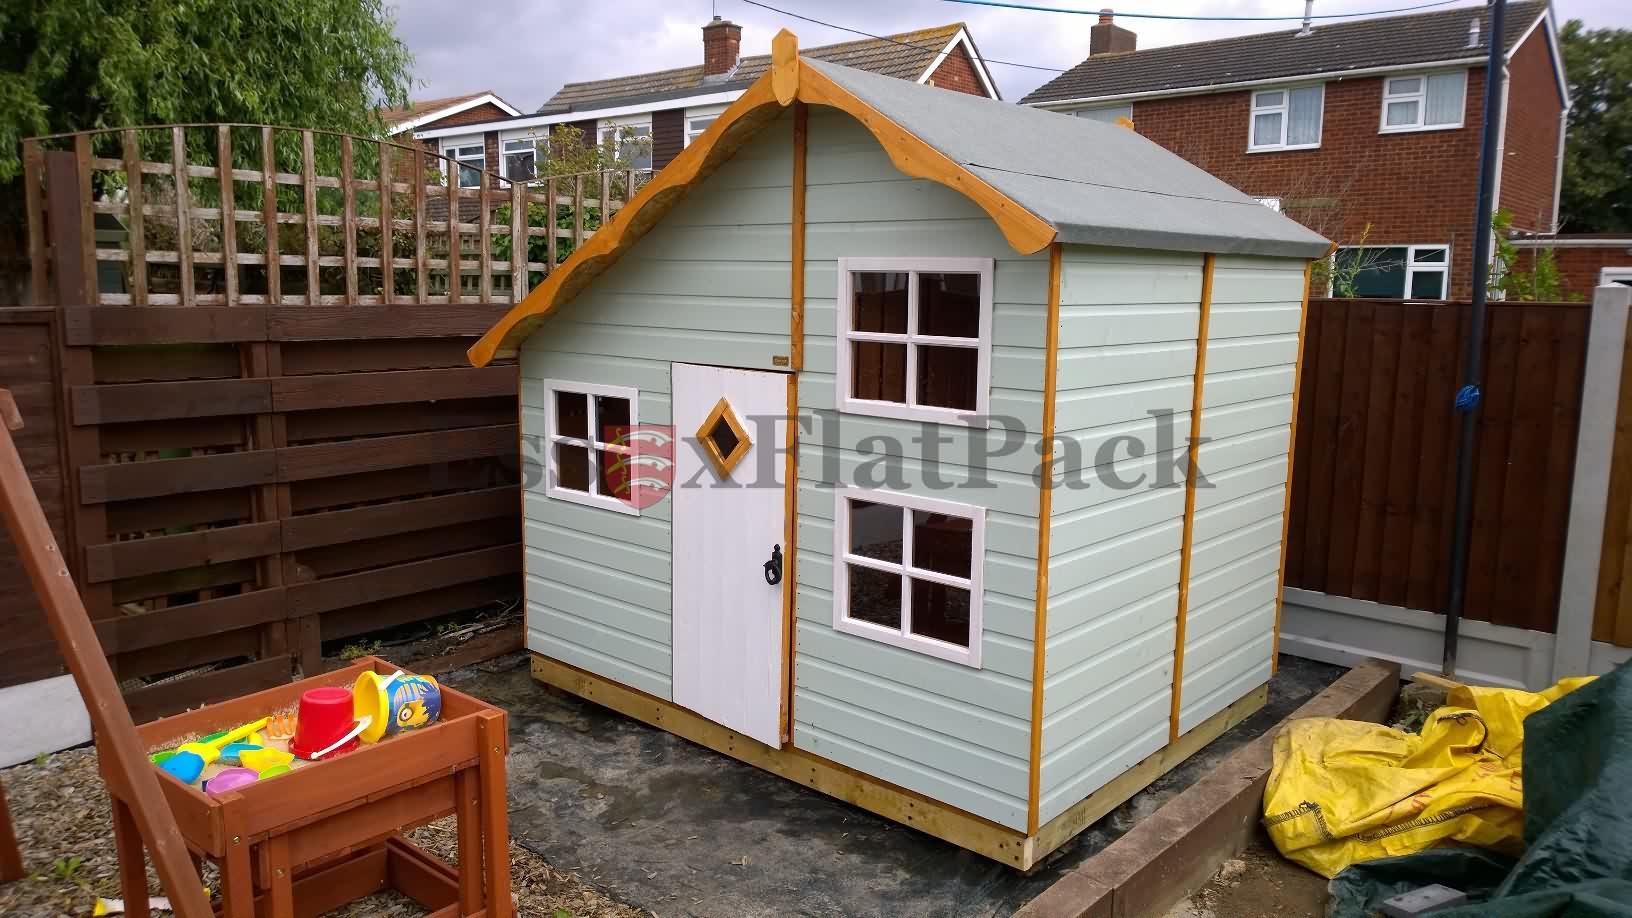 essexflatpack-playhouse-20170725135234.jpg